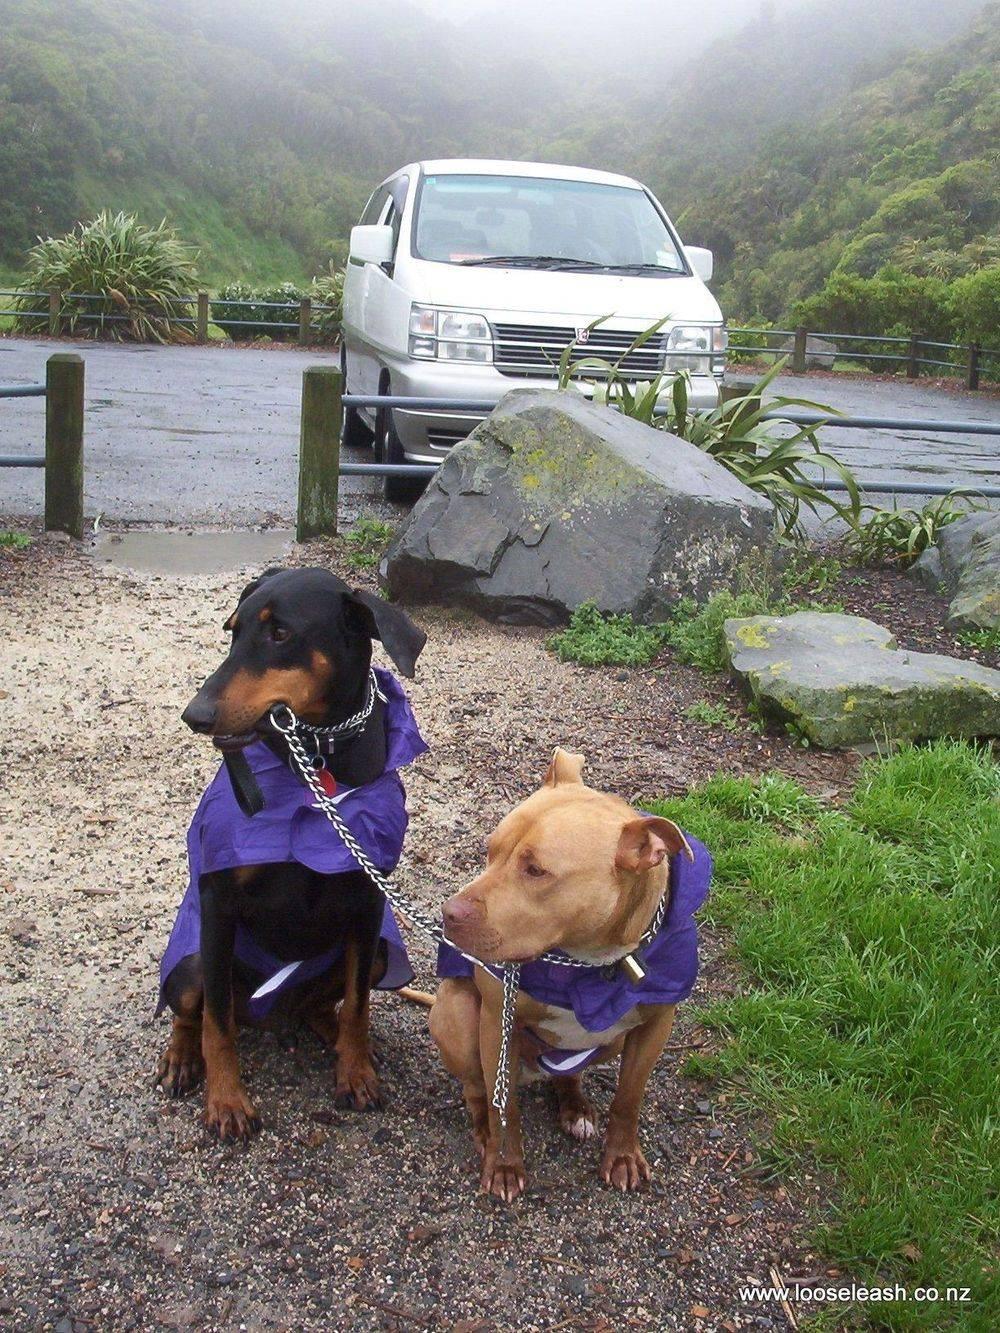 Waihinahina Dog Park Woof Woof Ruff Off Leash Dog Exercise Area (aka Dennis Duggan Park) A great dog walking area, whatever the weather! Dobermann & friend looking cute in their purple dog rain coats!